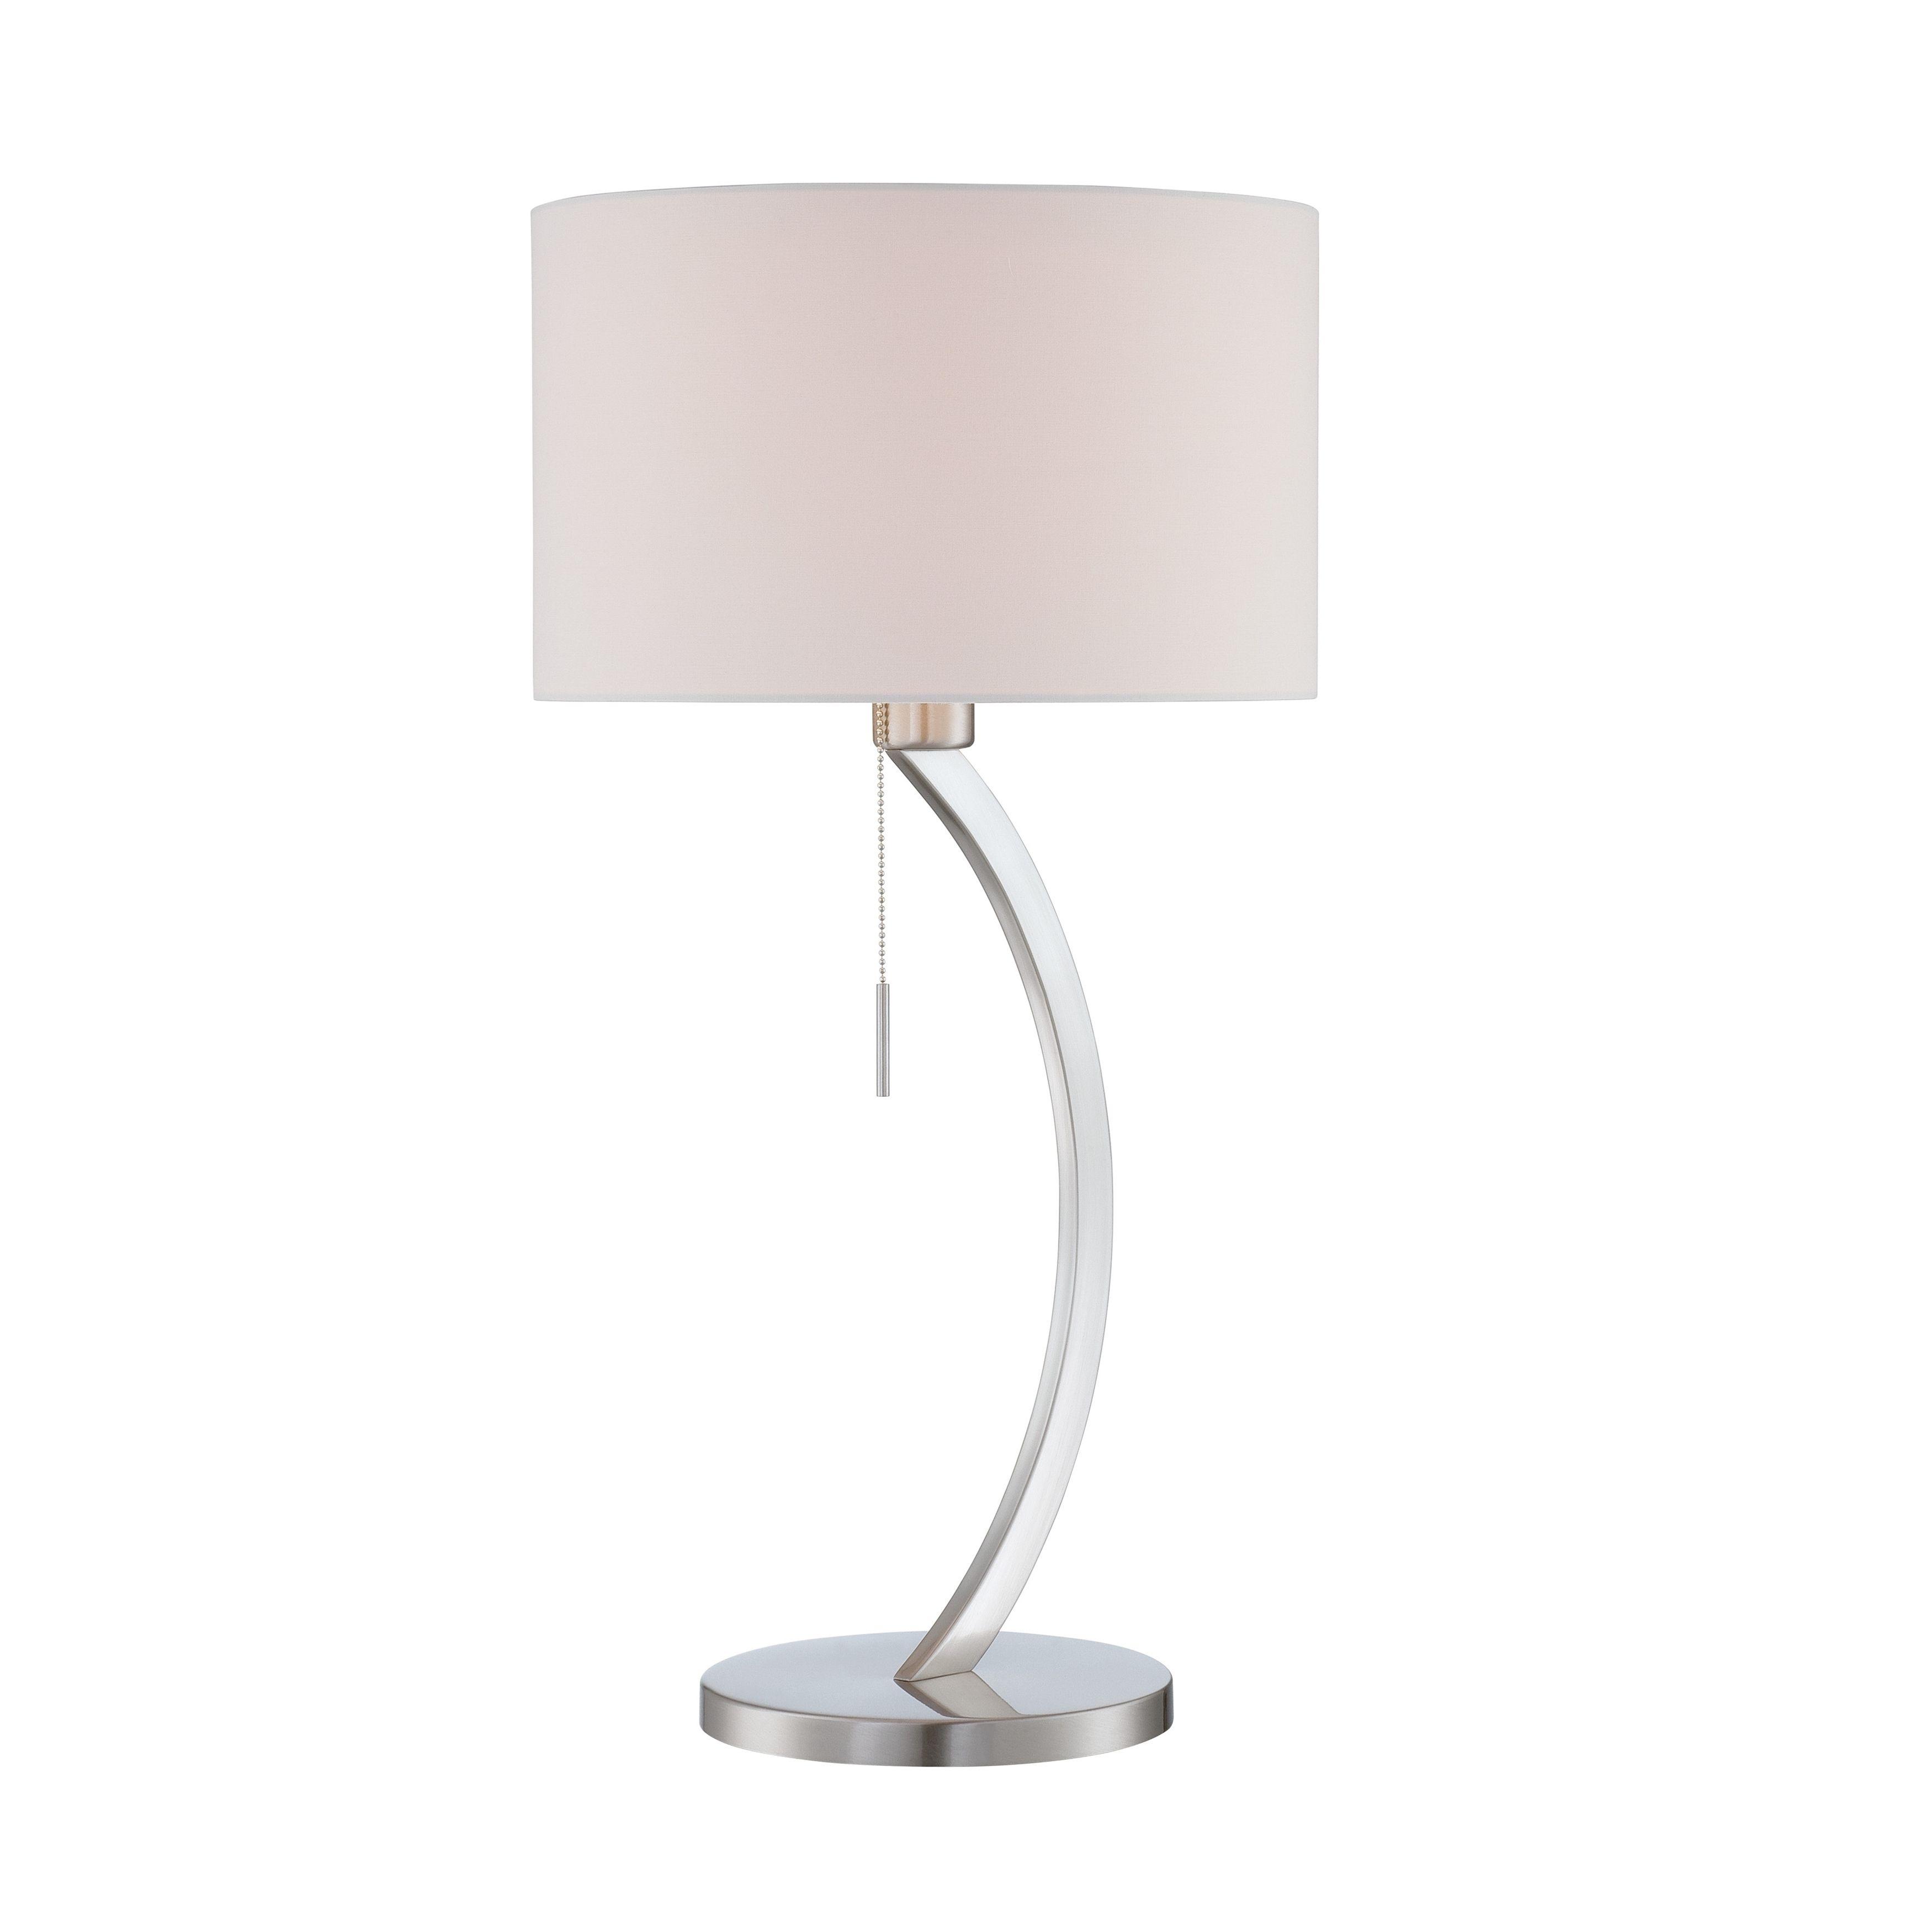 lamp sun lamps table globe funky chrome